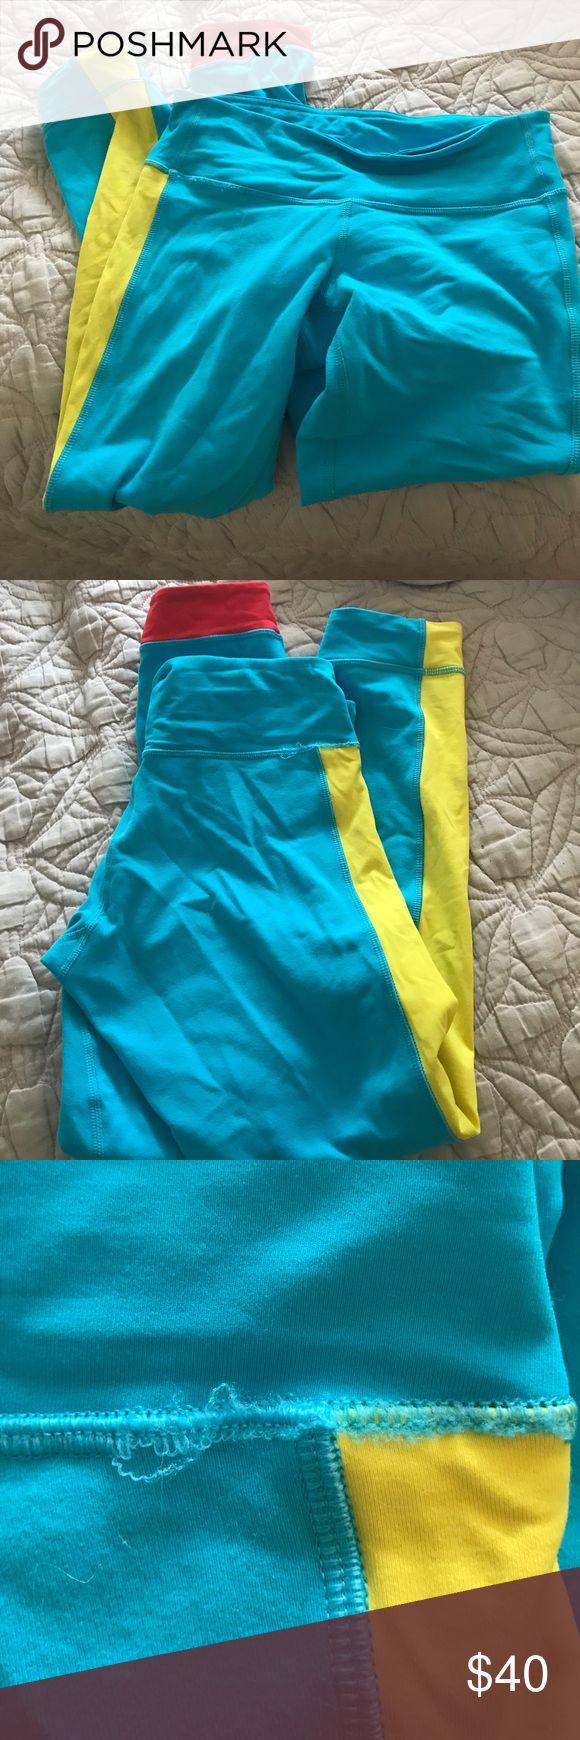 Best 25+ Turquoise pants ideas on Pinterest | Turquoise pants outfit,  Turquoise jeans and Aqua pants